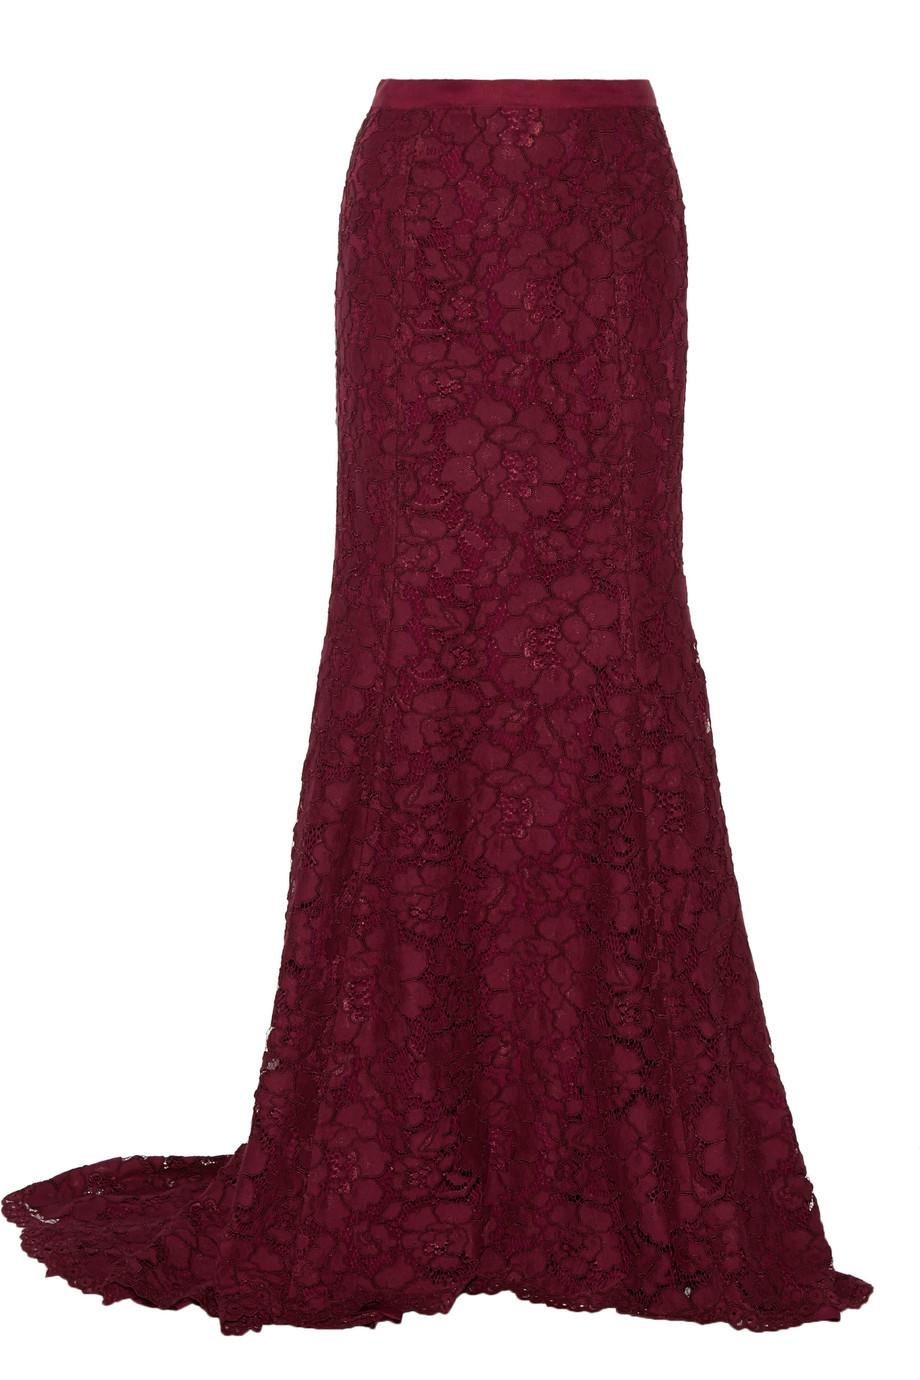 Oscar De La Renta Cotton-Blend Lace Maxi Skirt, Burgundy, Women's, Size: 6